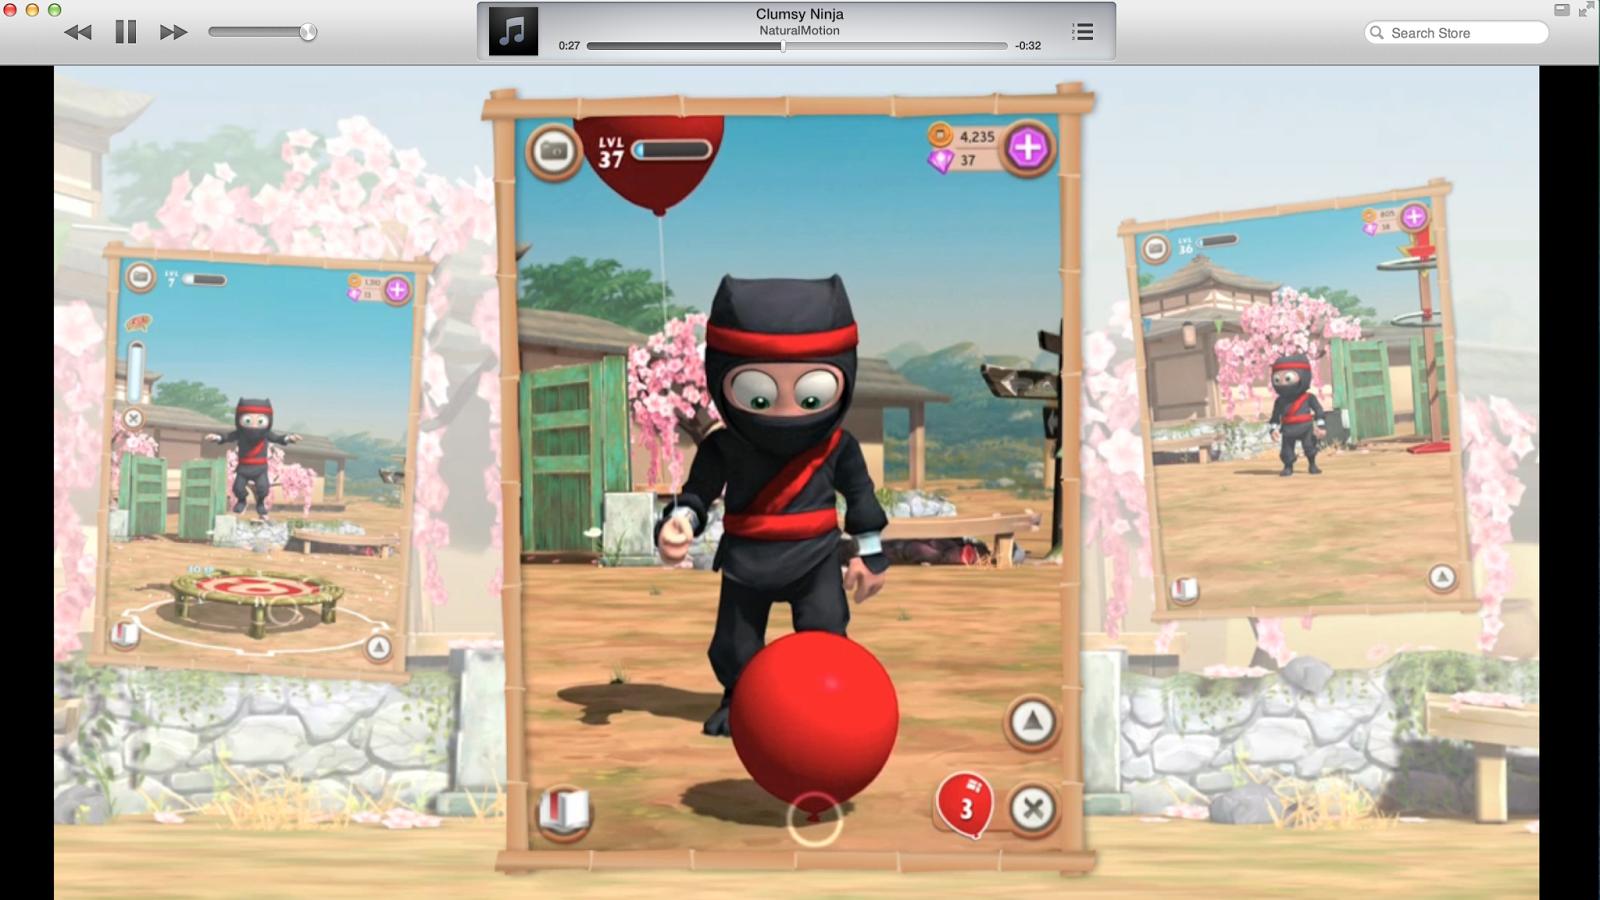 Clumsy Ninja Full Apk resimi 12